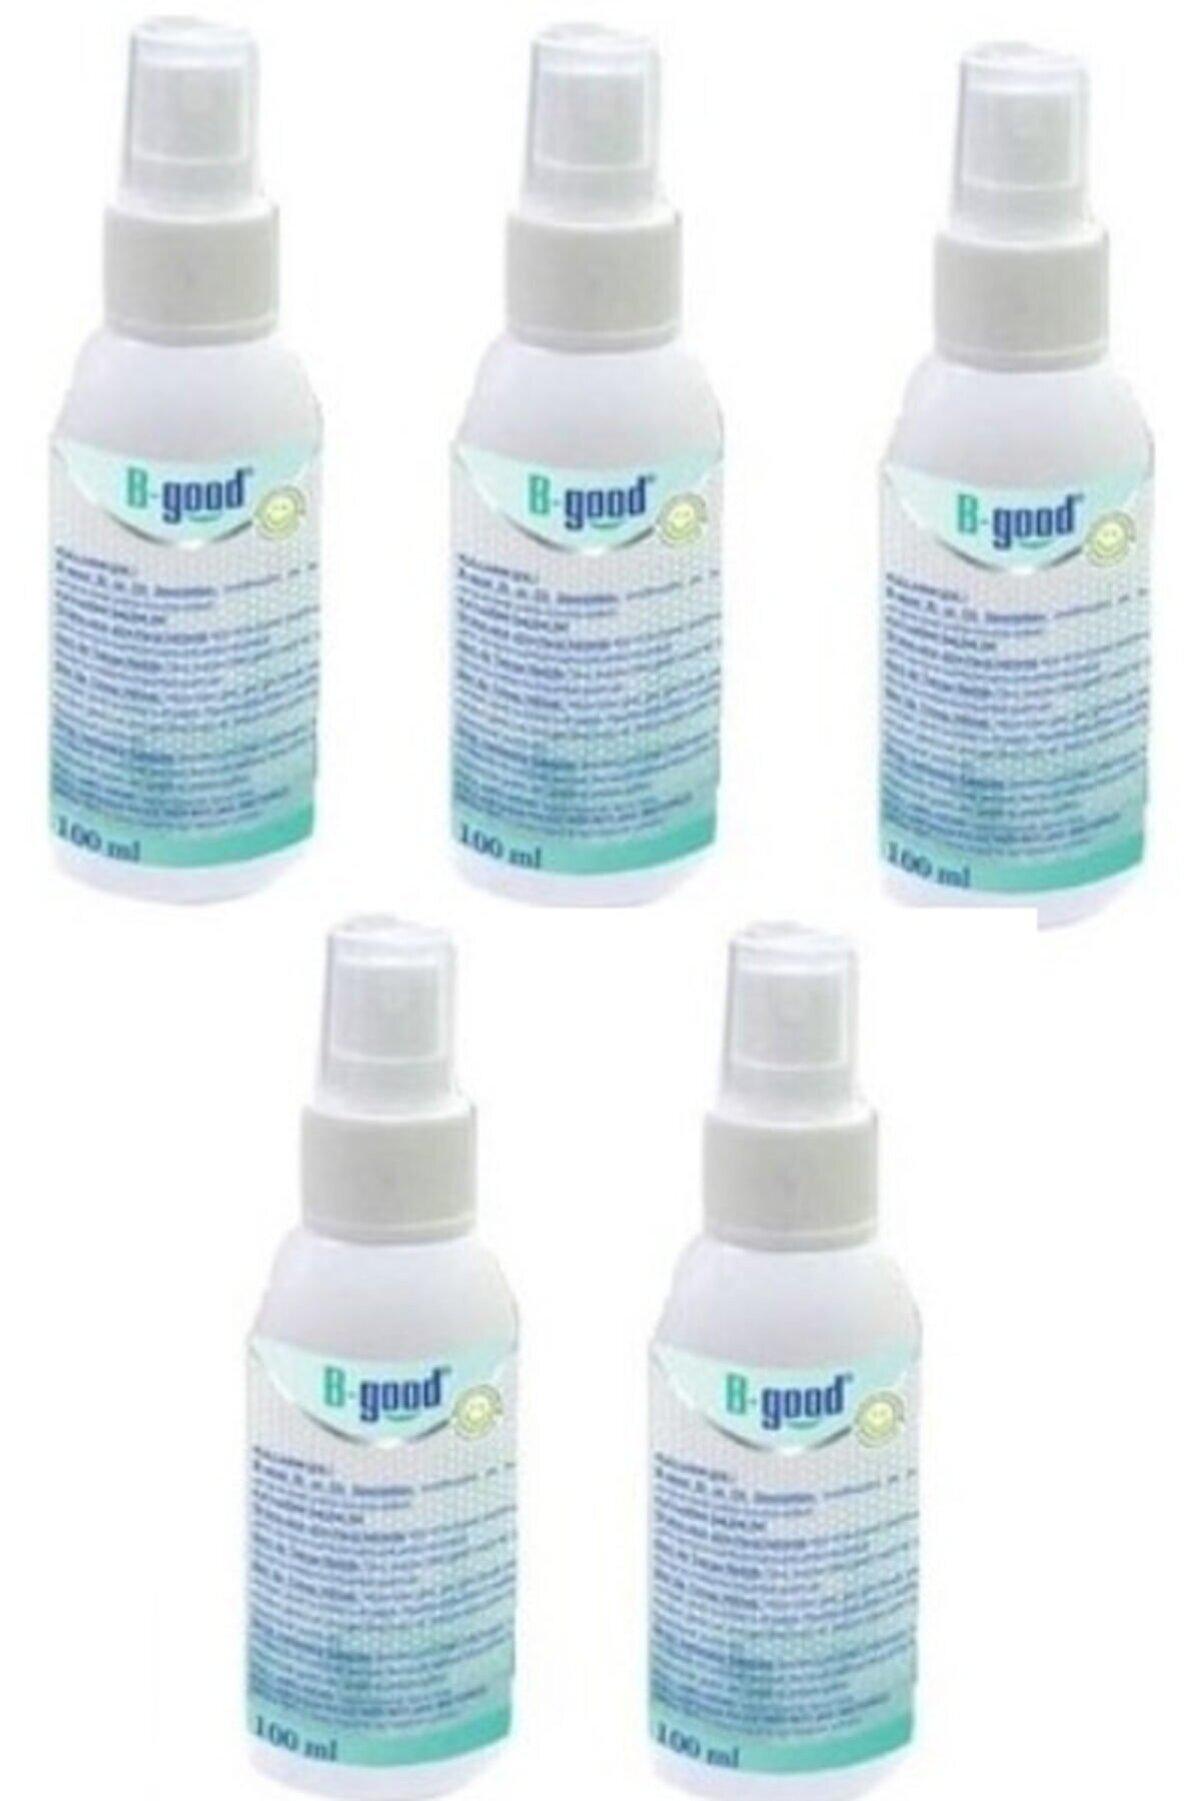 B-GOOD Antiseptik El Dezenfektanı 100 ml 5 Adet